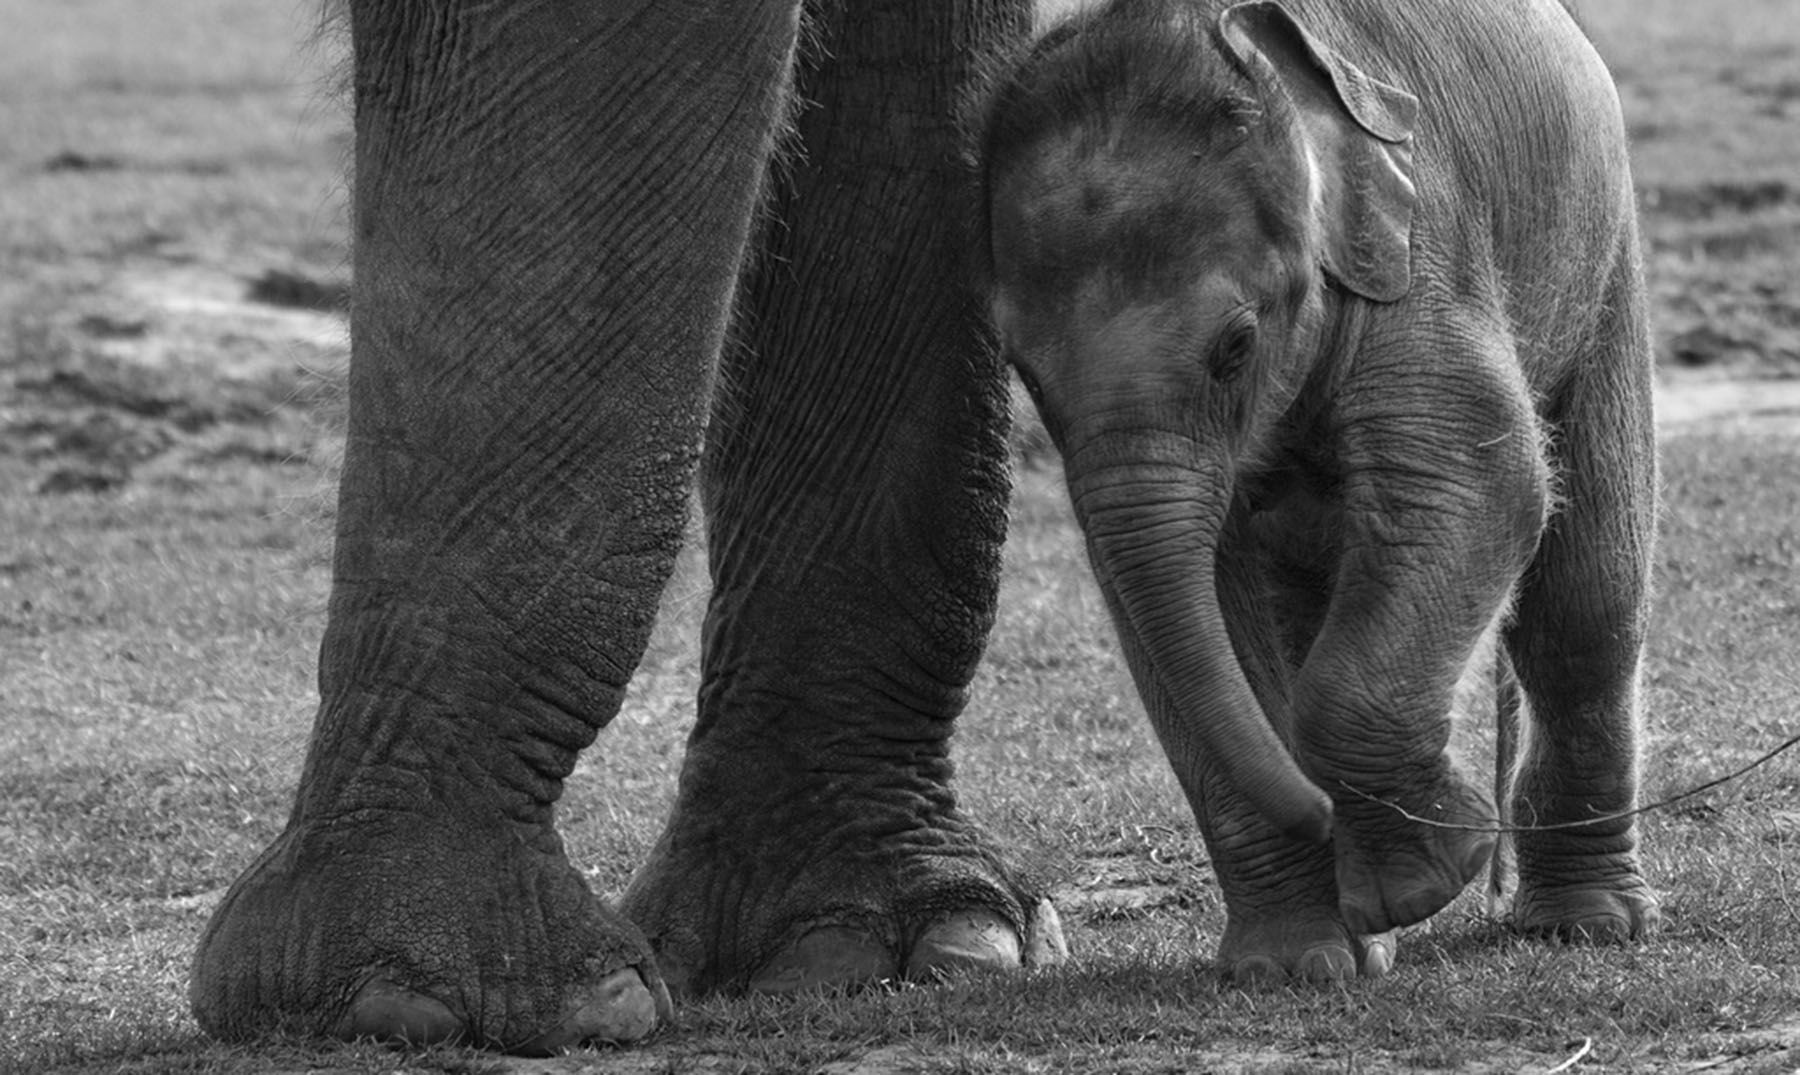 Fotos de elefantes bebes cool elefante del beb foto de - Fotos de elefantes bebes ...